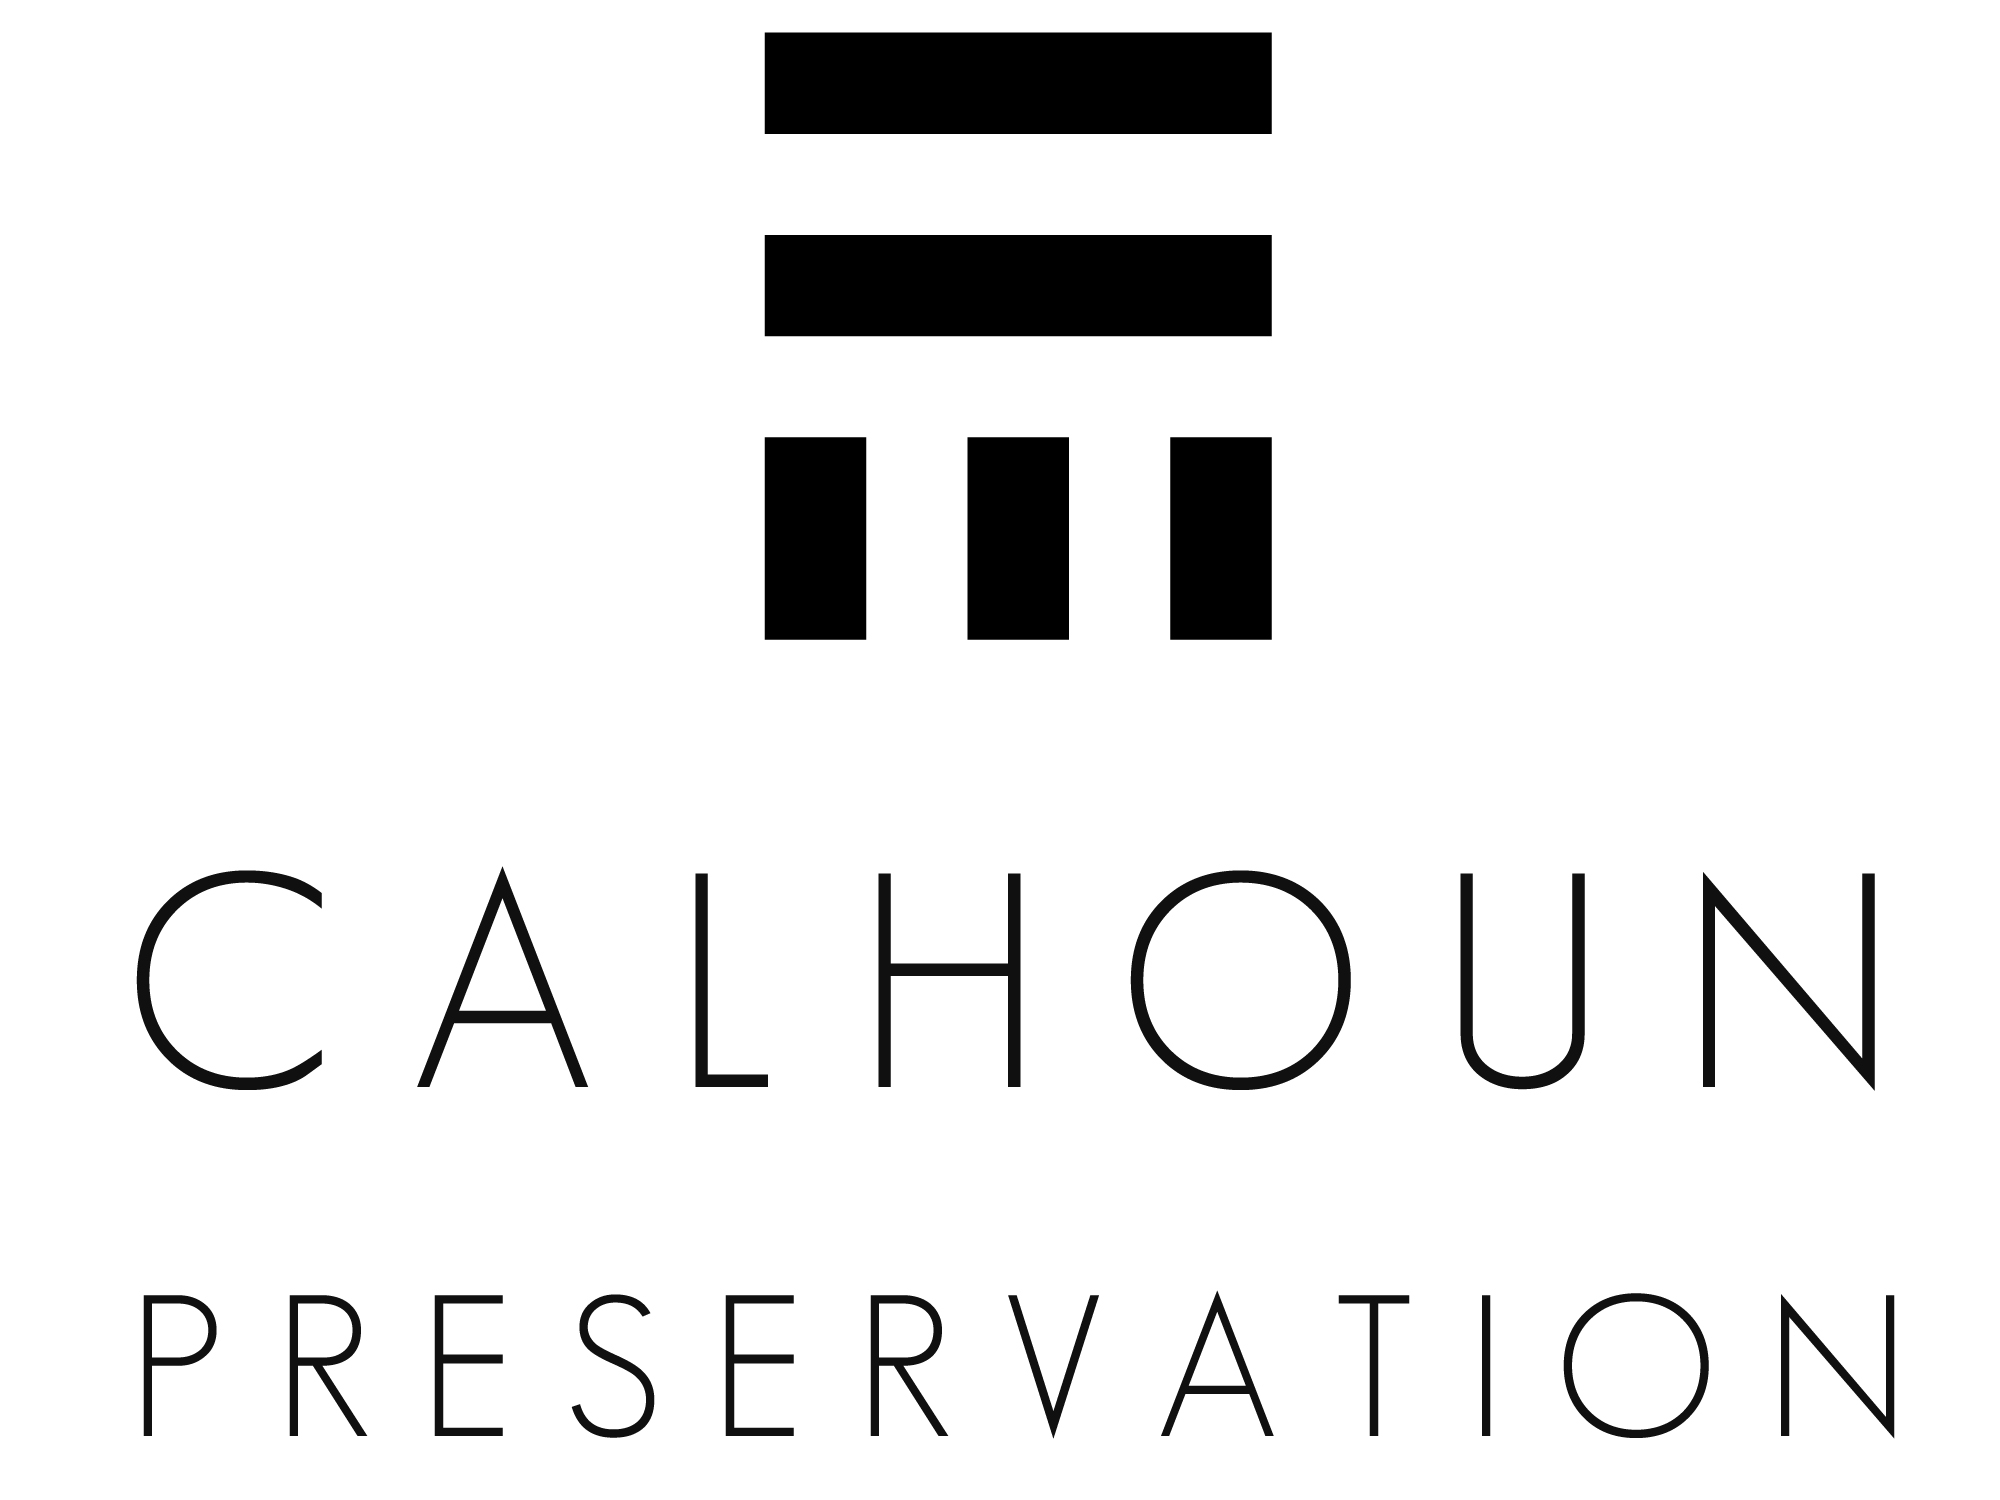 Calhoun Preservation